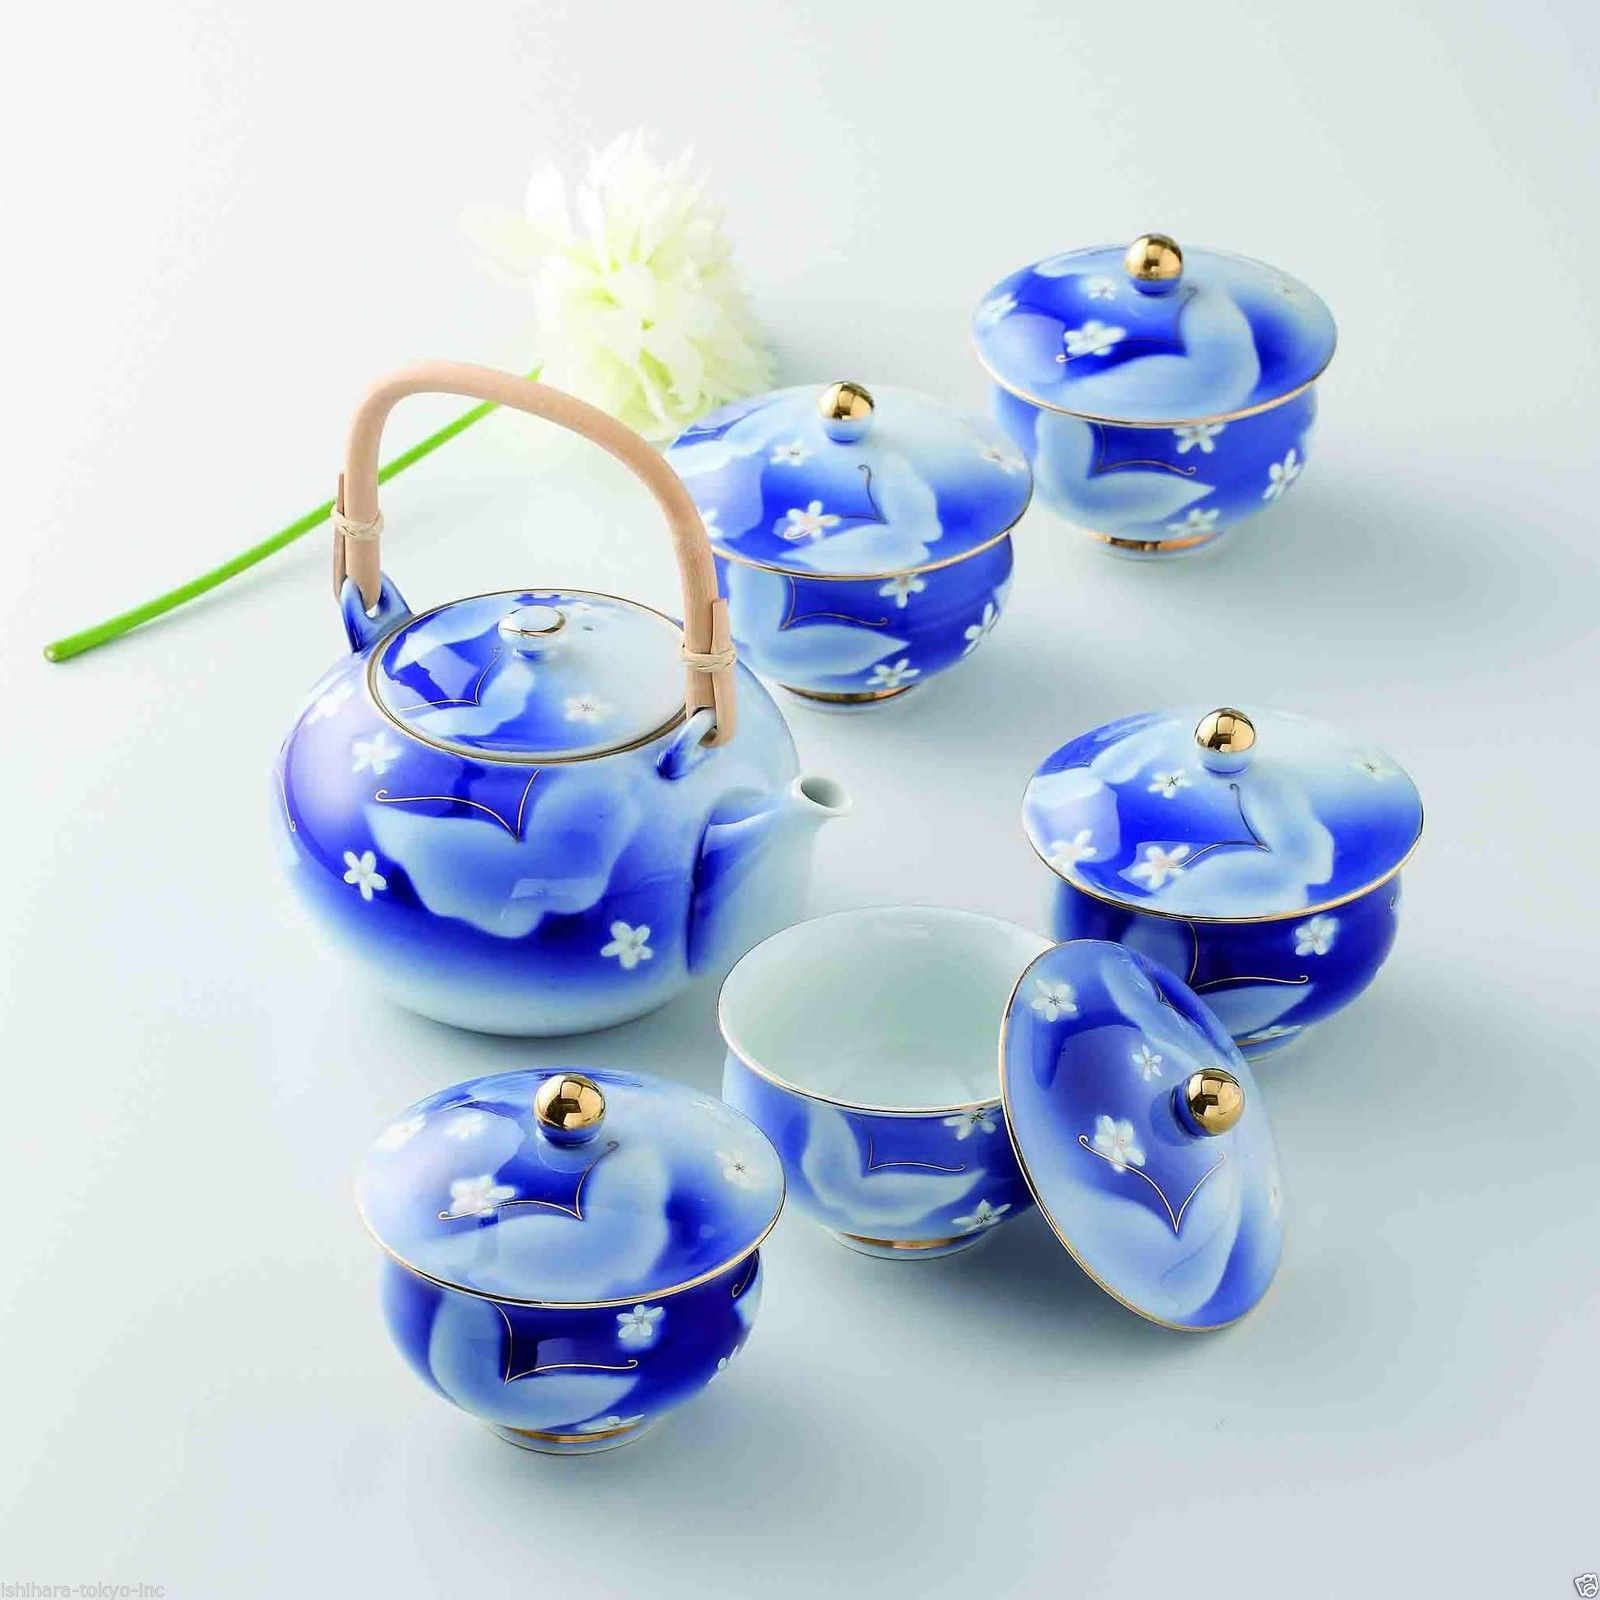 [Value] Hasami Porcelain: Butterfly - Japanese Kyusu Tea pot & 5 tea cup Set Box - $232.82